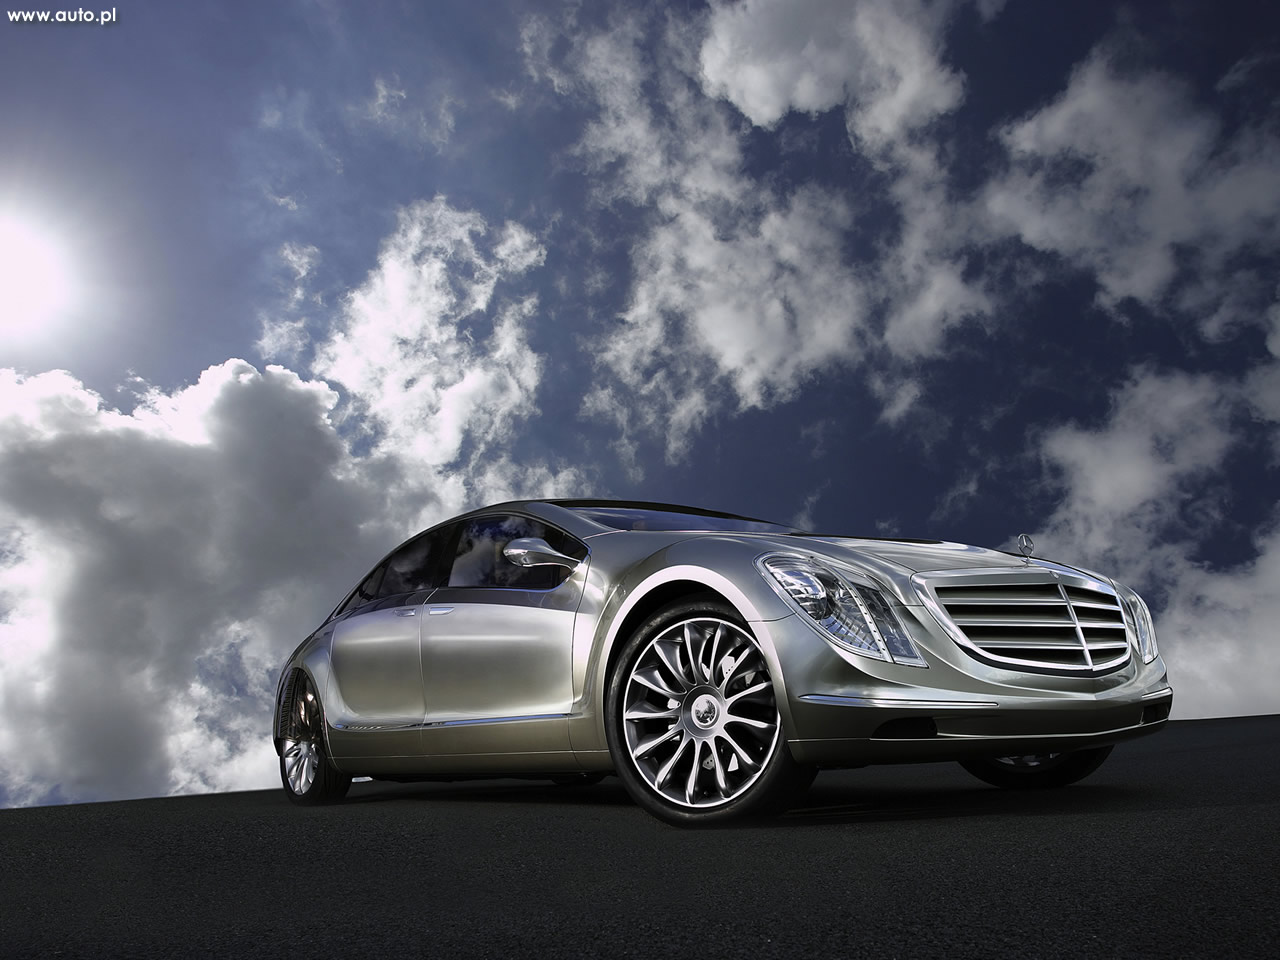 http://img.auto.com.pl/tapety/1280x960/135/135_Mercedes-Benz_F_700_research_car_018.jpg